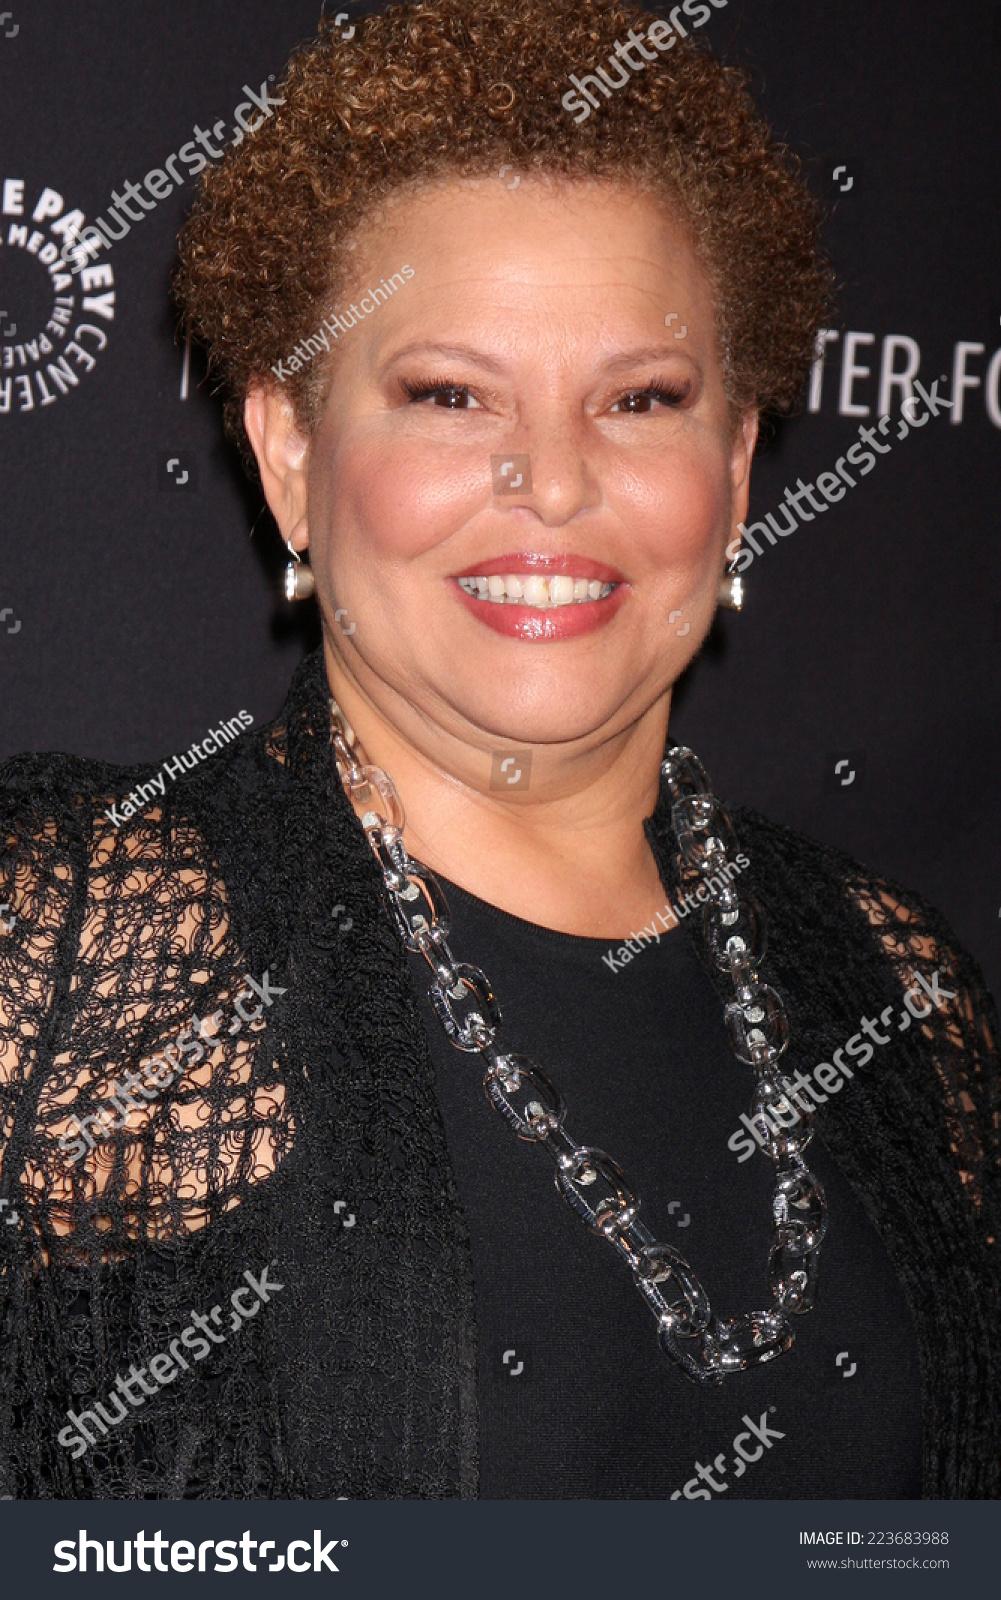 Sonya Eddy born June 17, 1967 (age 51)